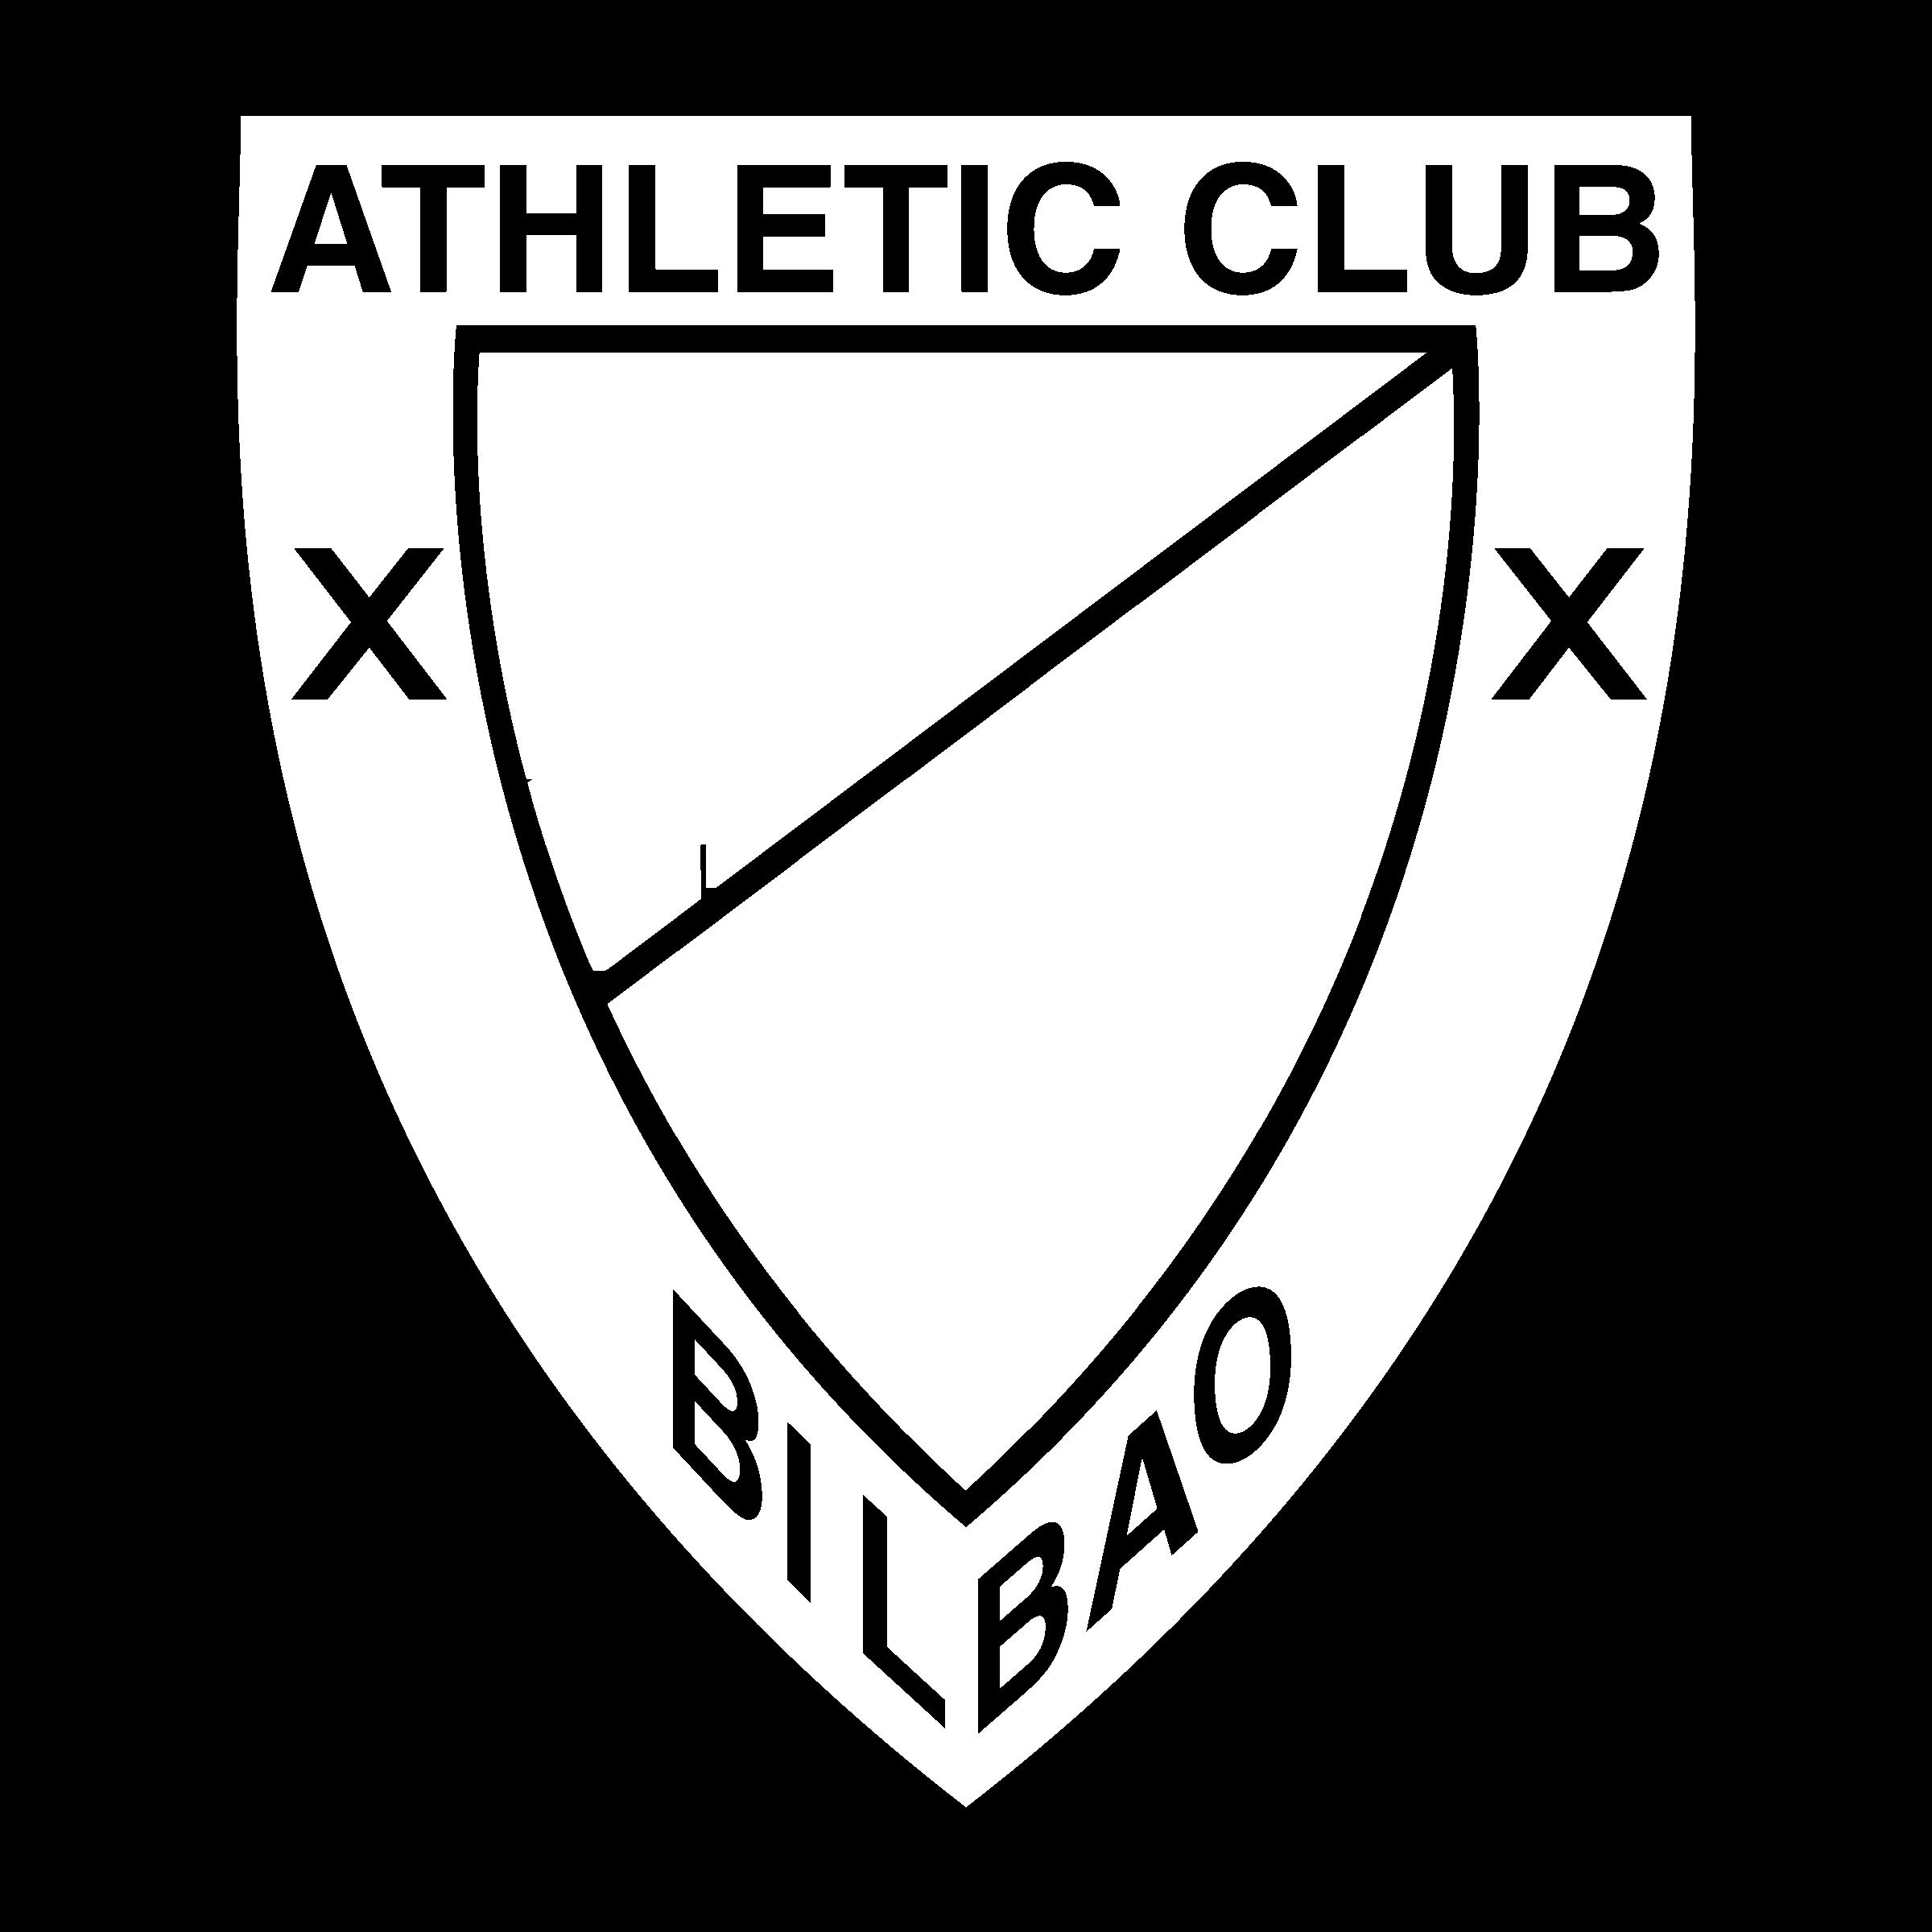 Athletic Club Bilbao 01 Logo PNG Transparent & SVG Vector ...